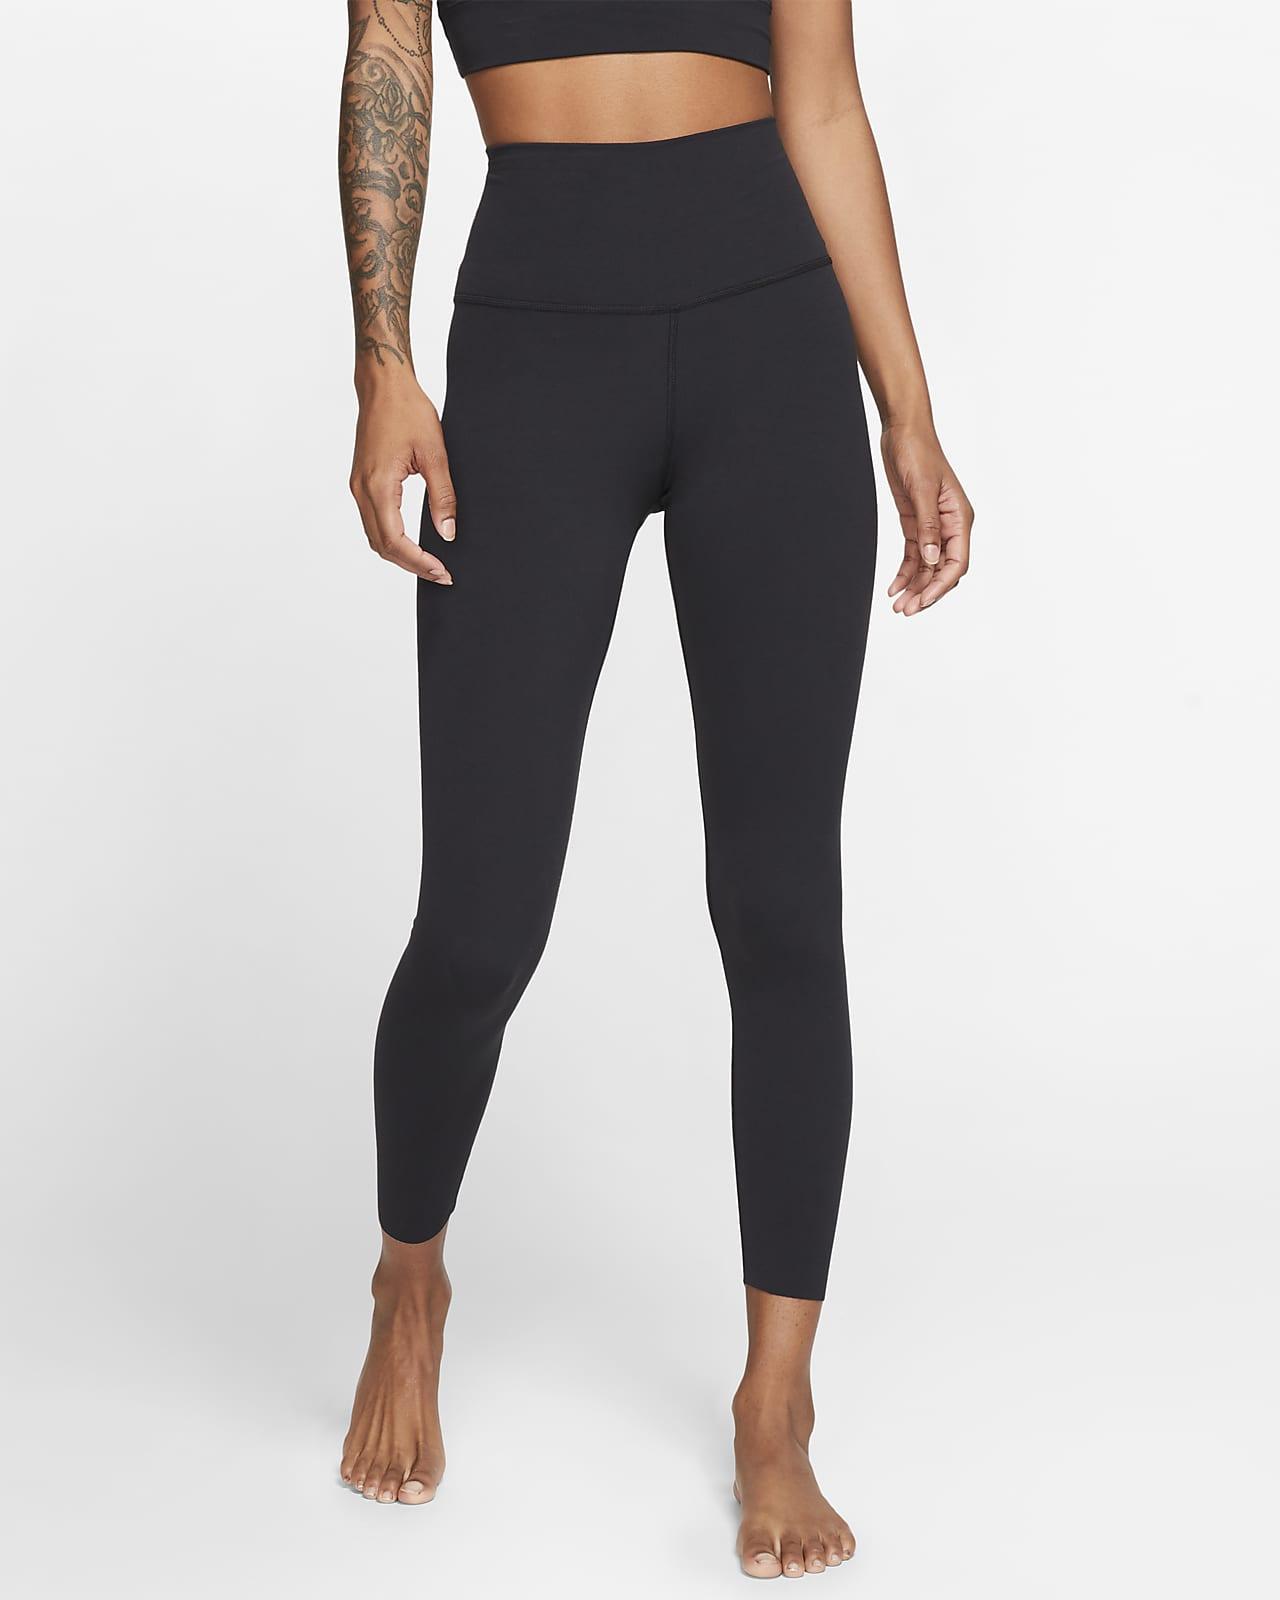 Legging 7/8 taille haute avec poche Nike Yoga Luxe pour Femme